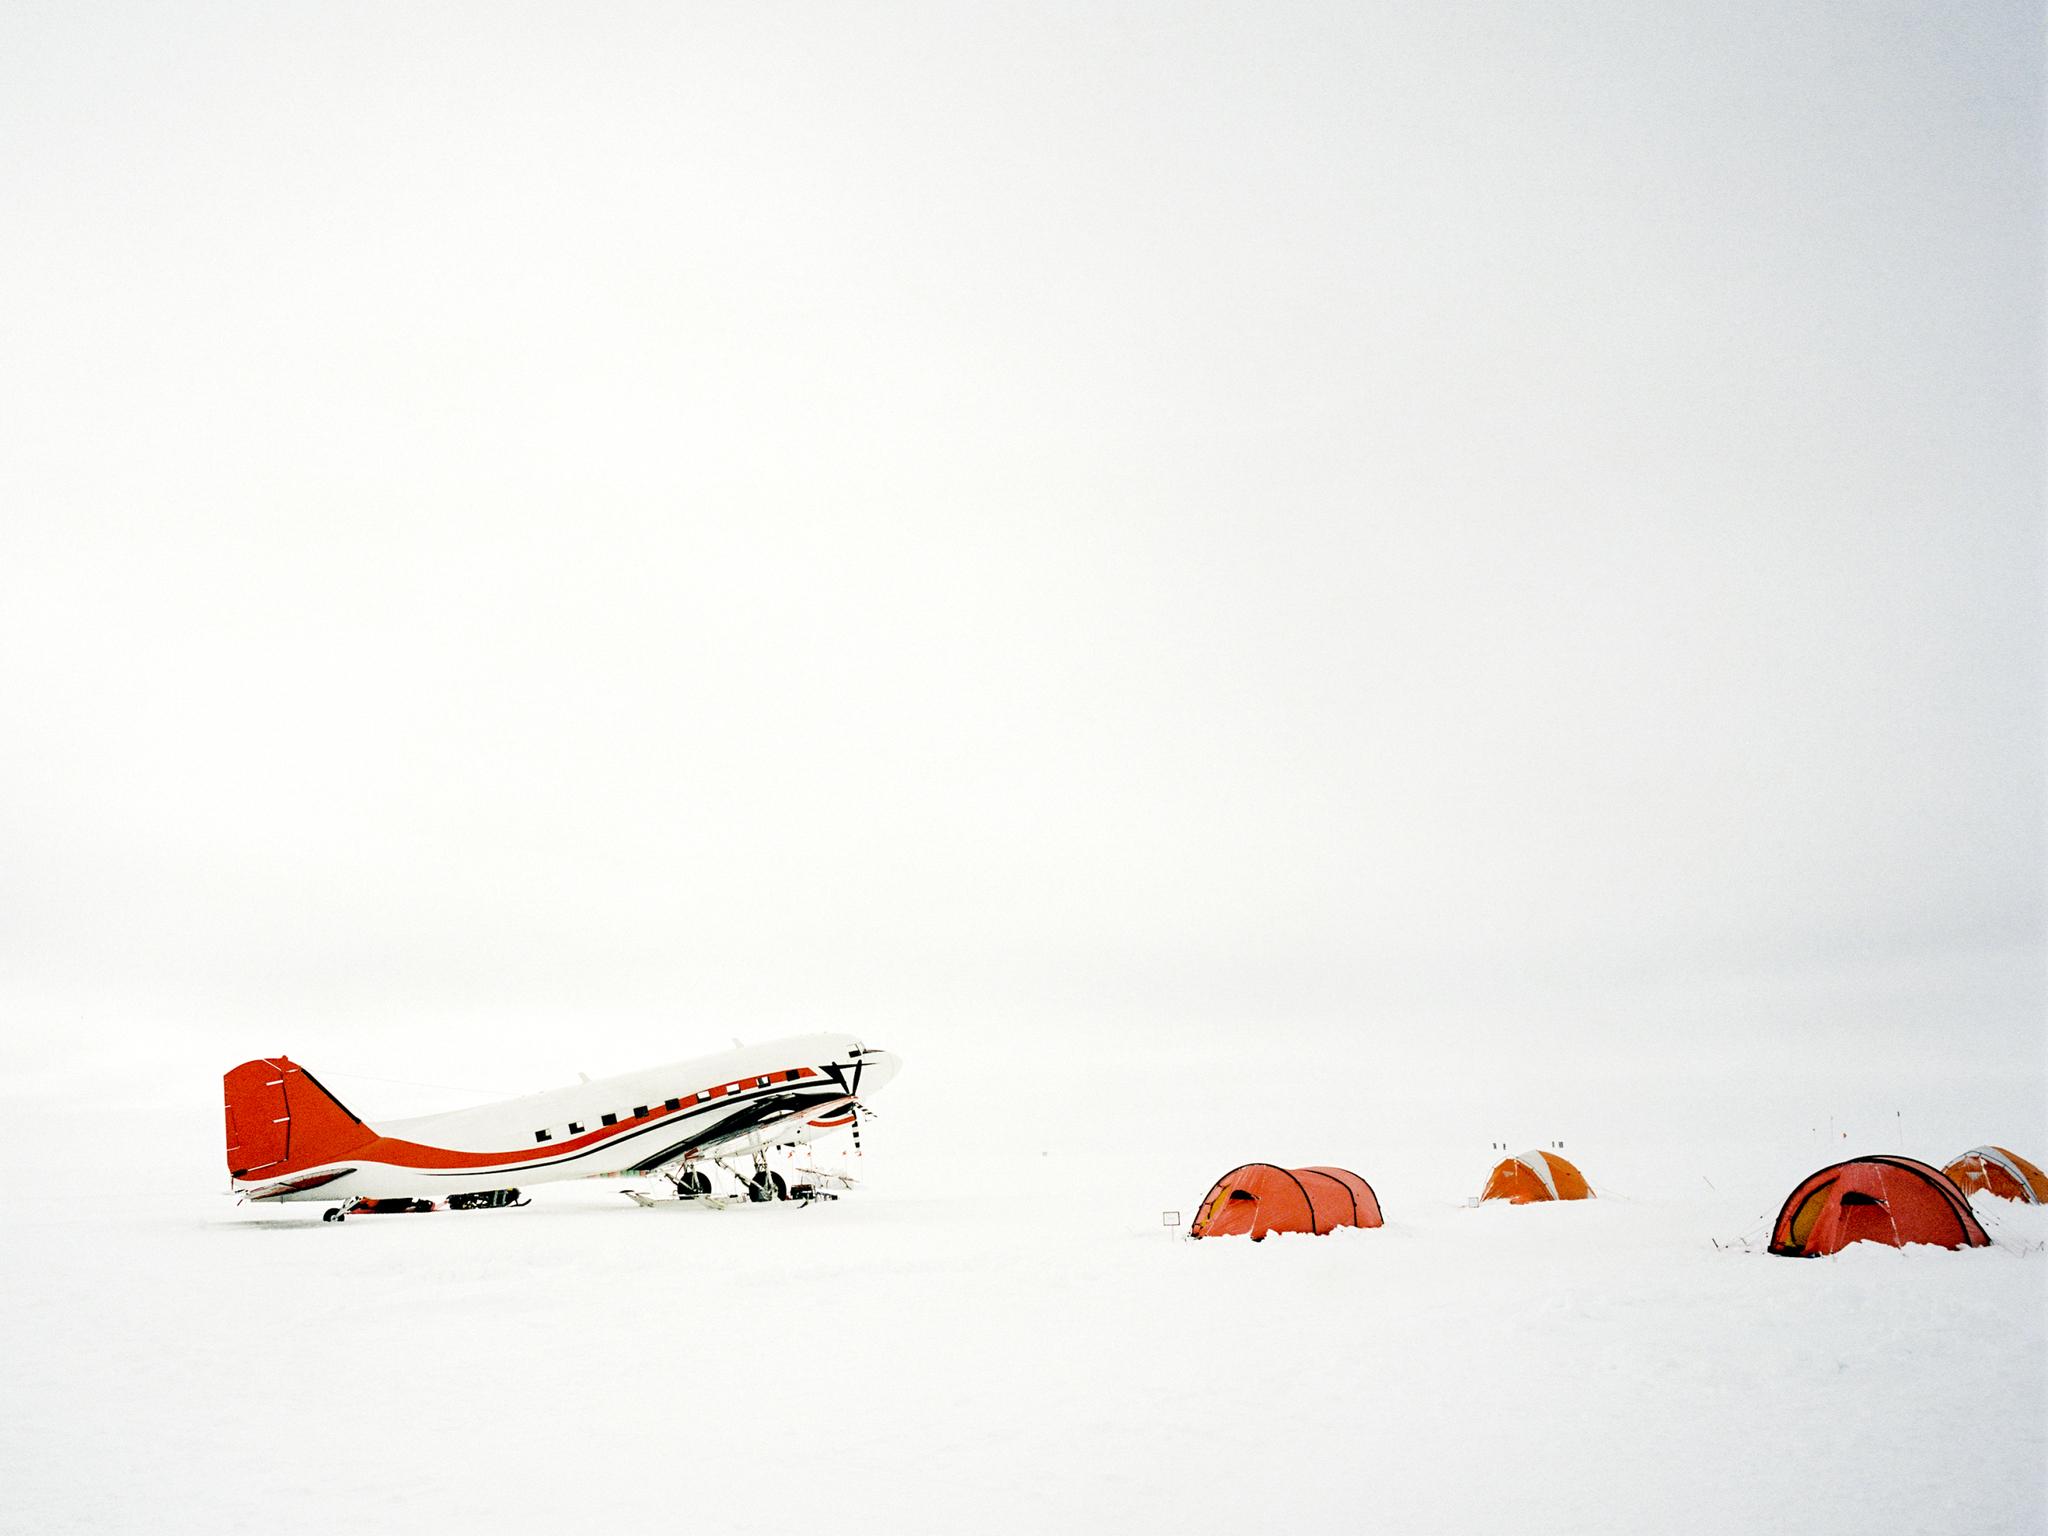 Airbnb Antartide - Neomag.